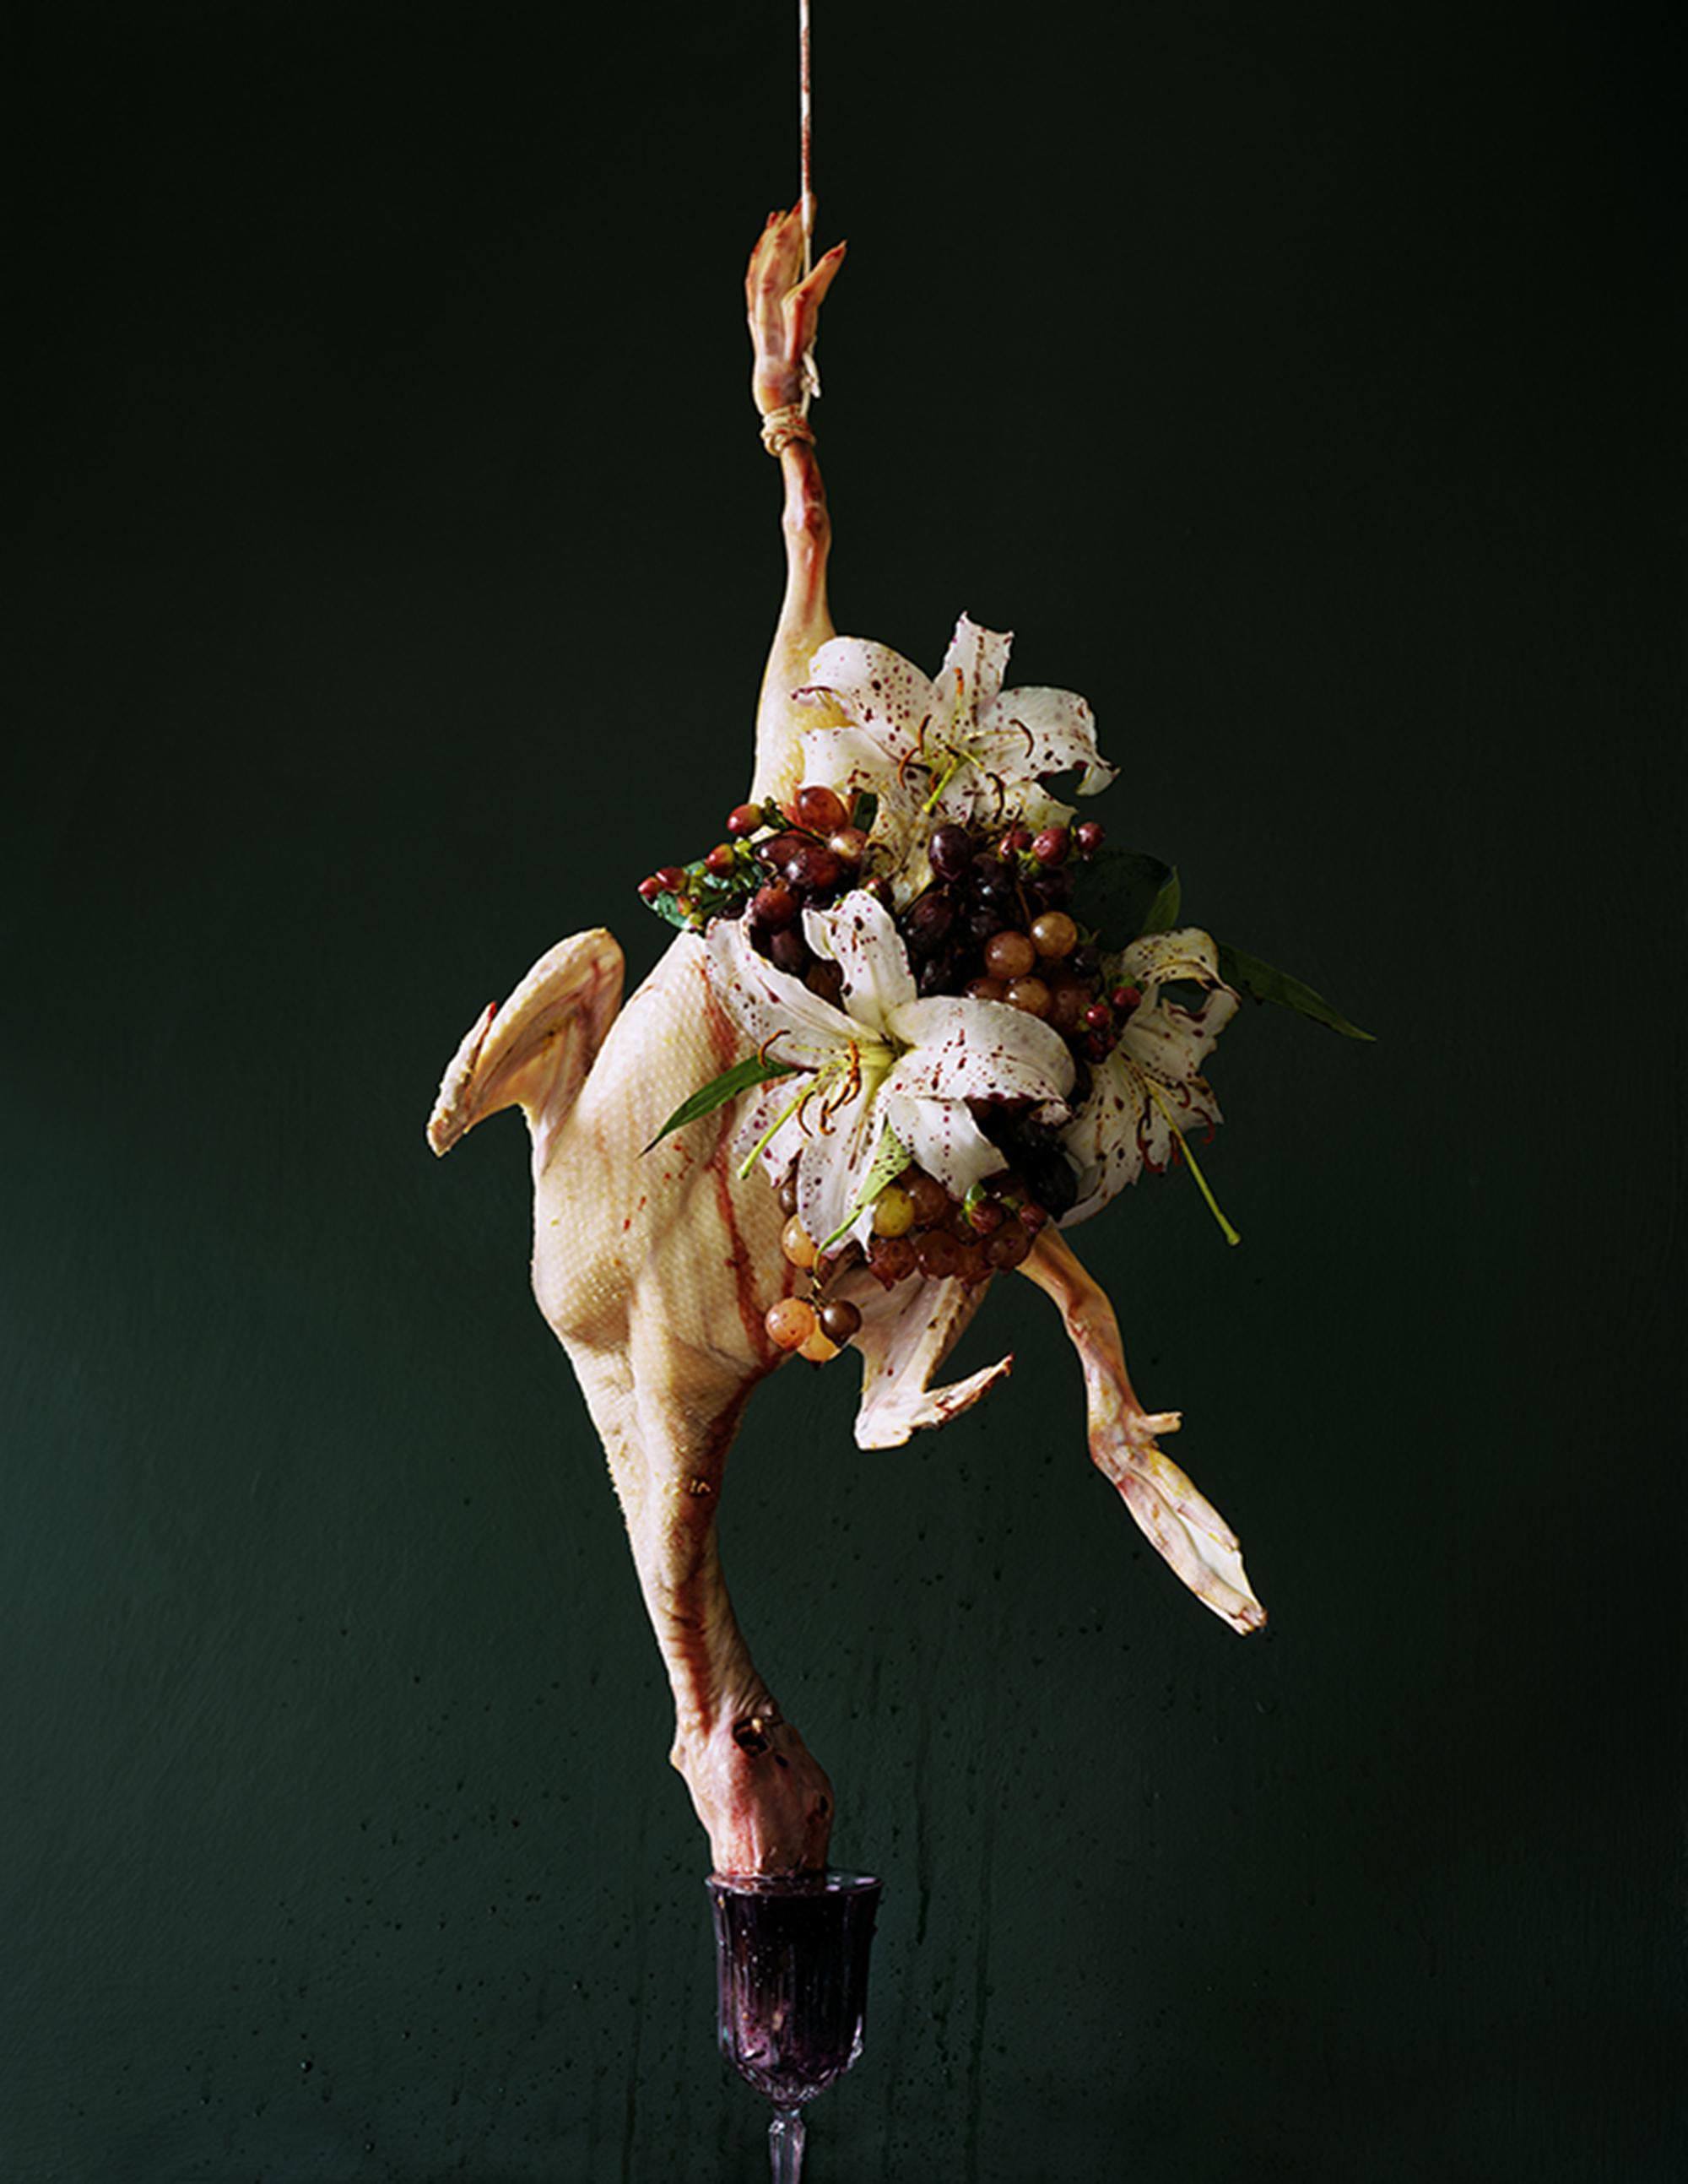 'Luxuria' by artist Tara Sellios (2013) - Image courtesy of Tara Sellios for Homesick Magazine Issue #1   www.tarasellios.com